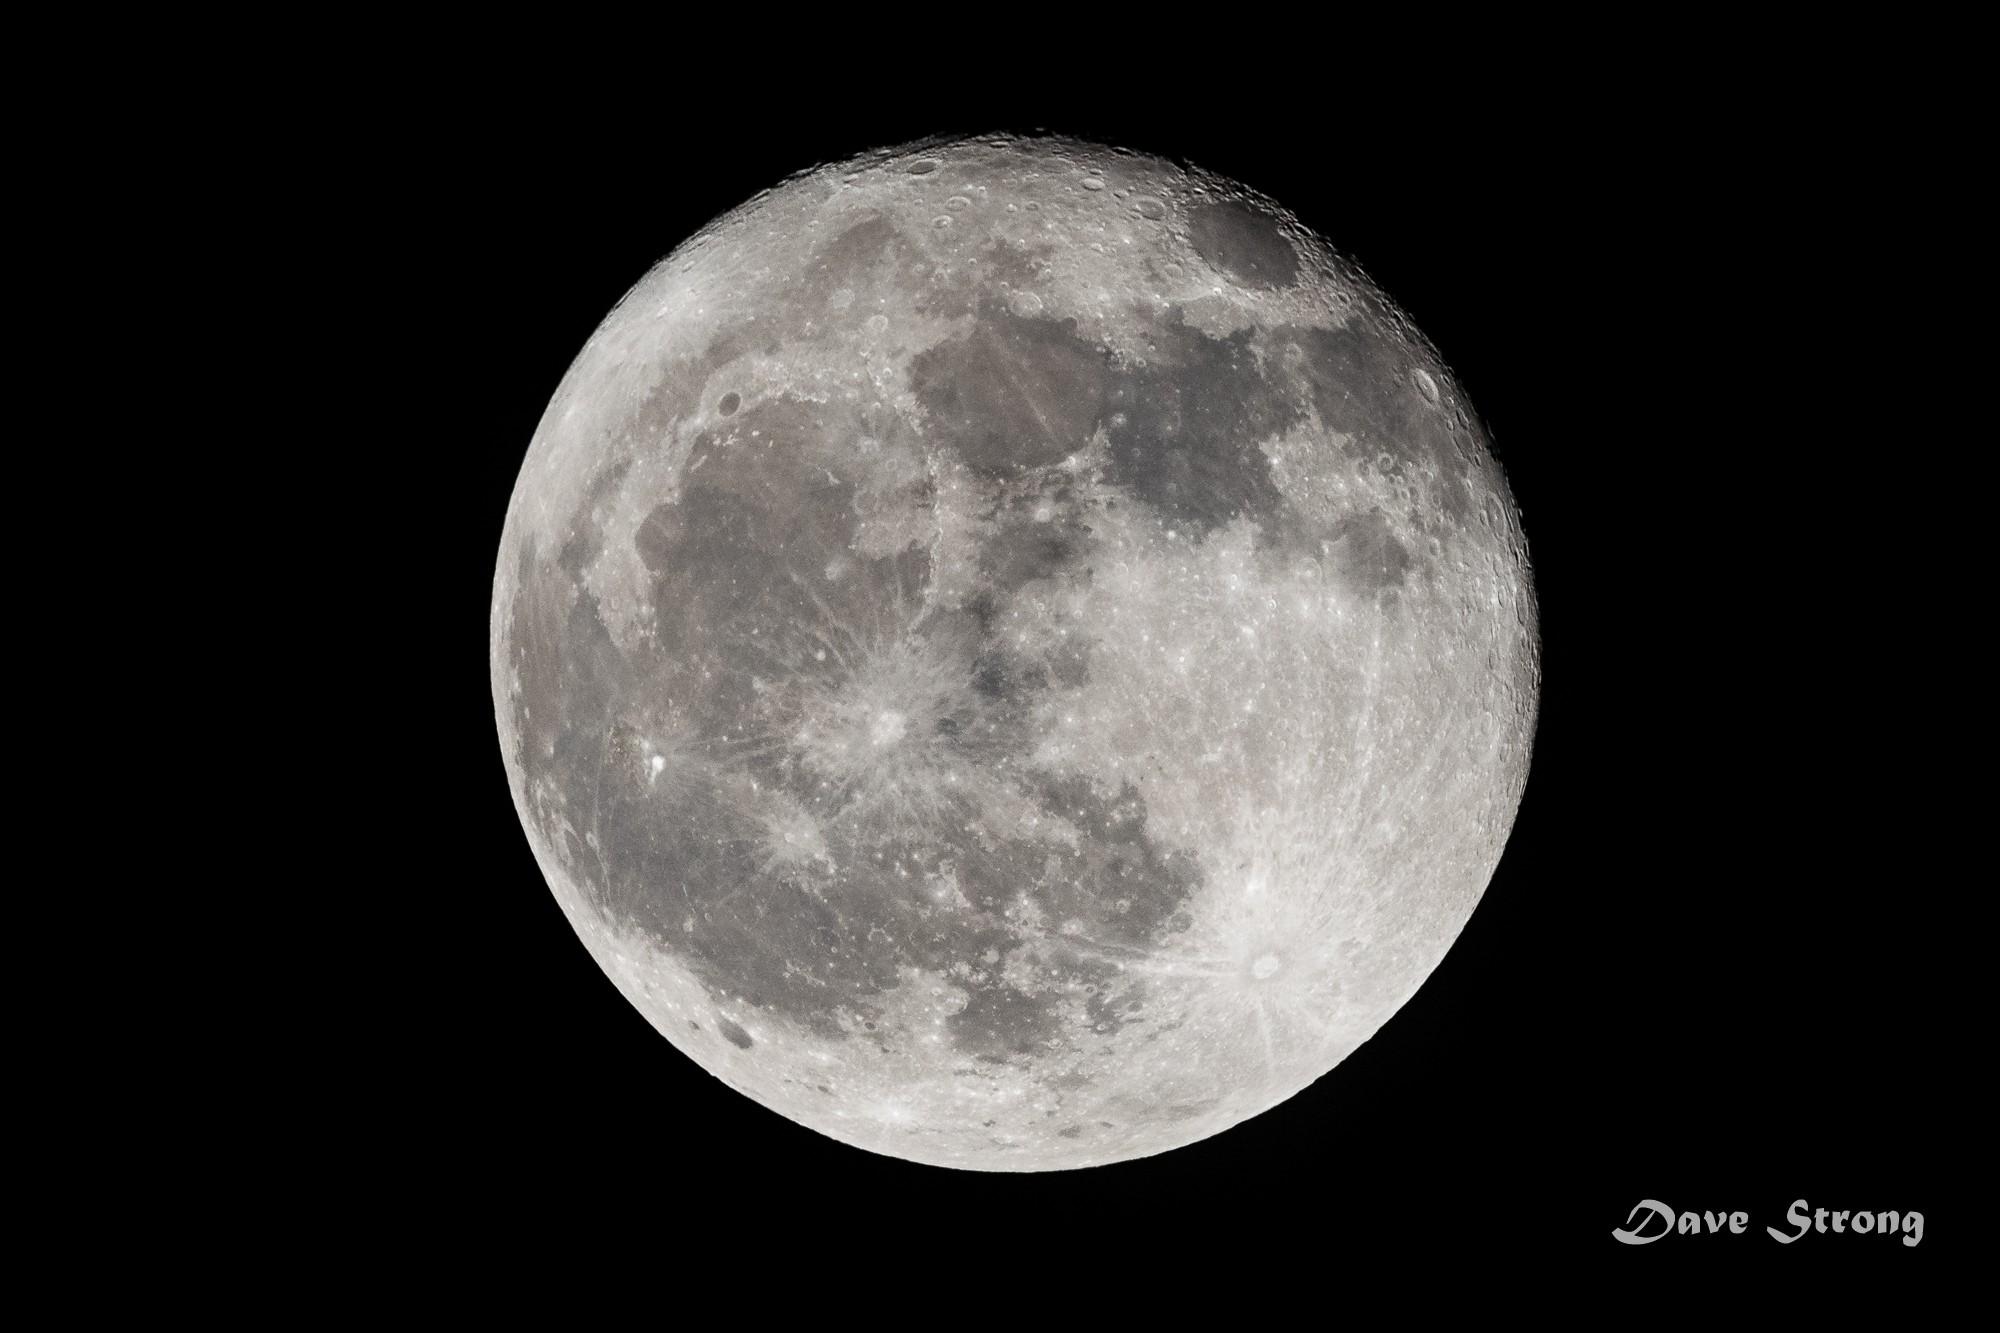 Moon_10_14_19 2000x1333.jpg